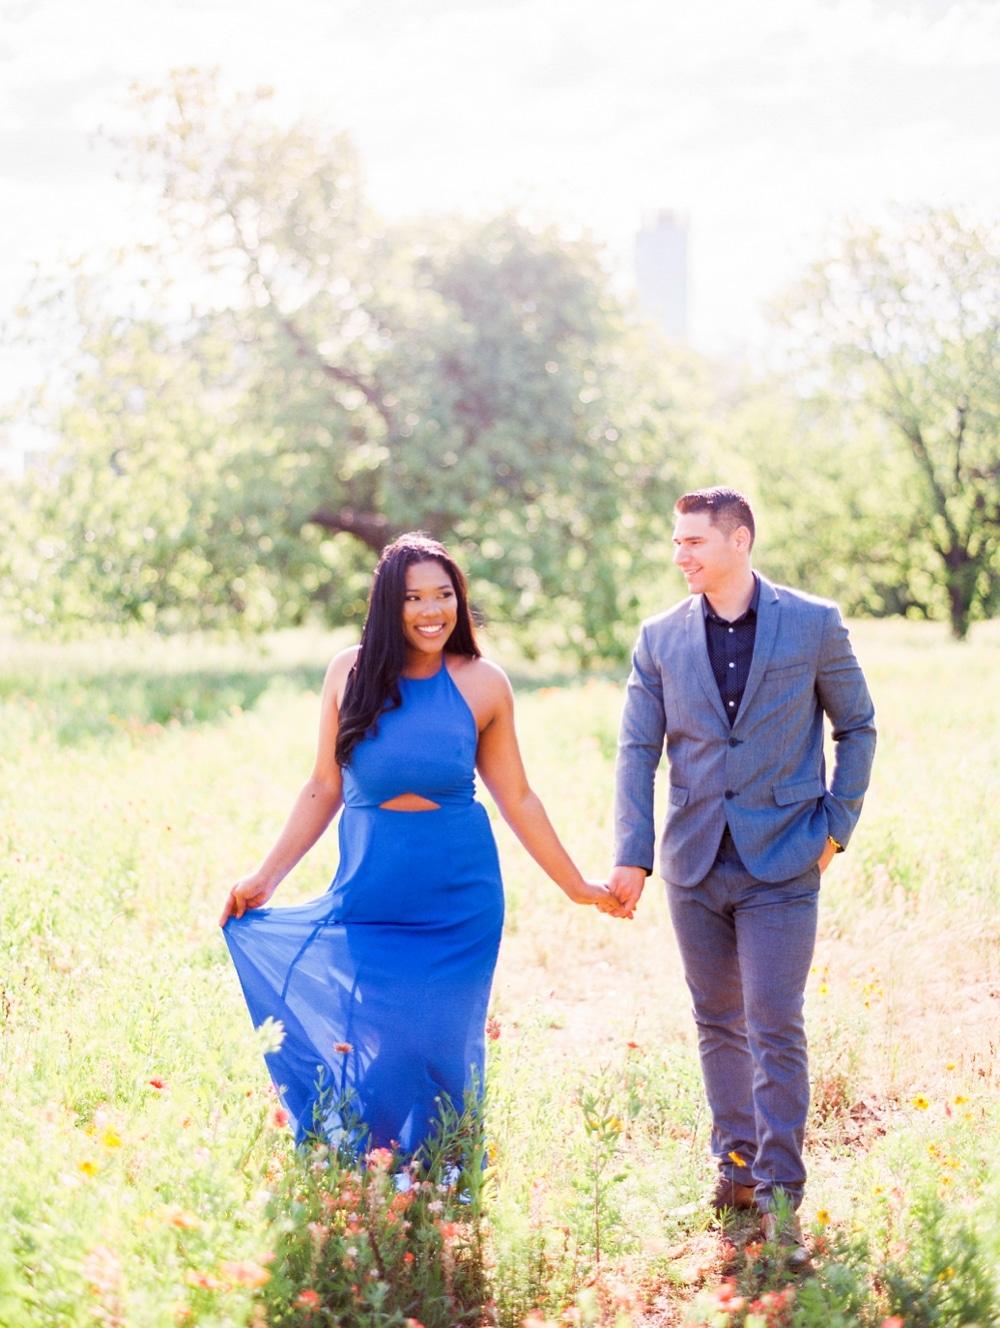 kristin-la-voie-photography-austin-wedding-photographer-14